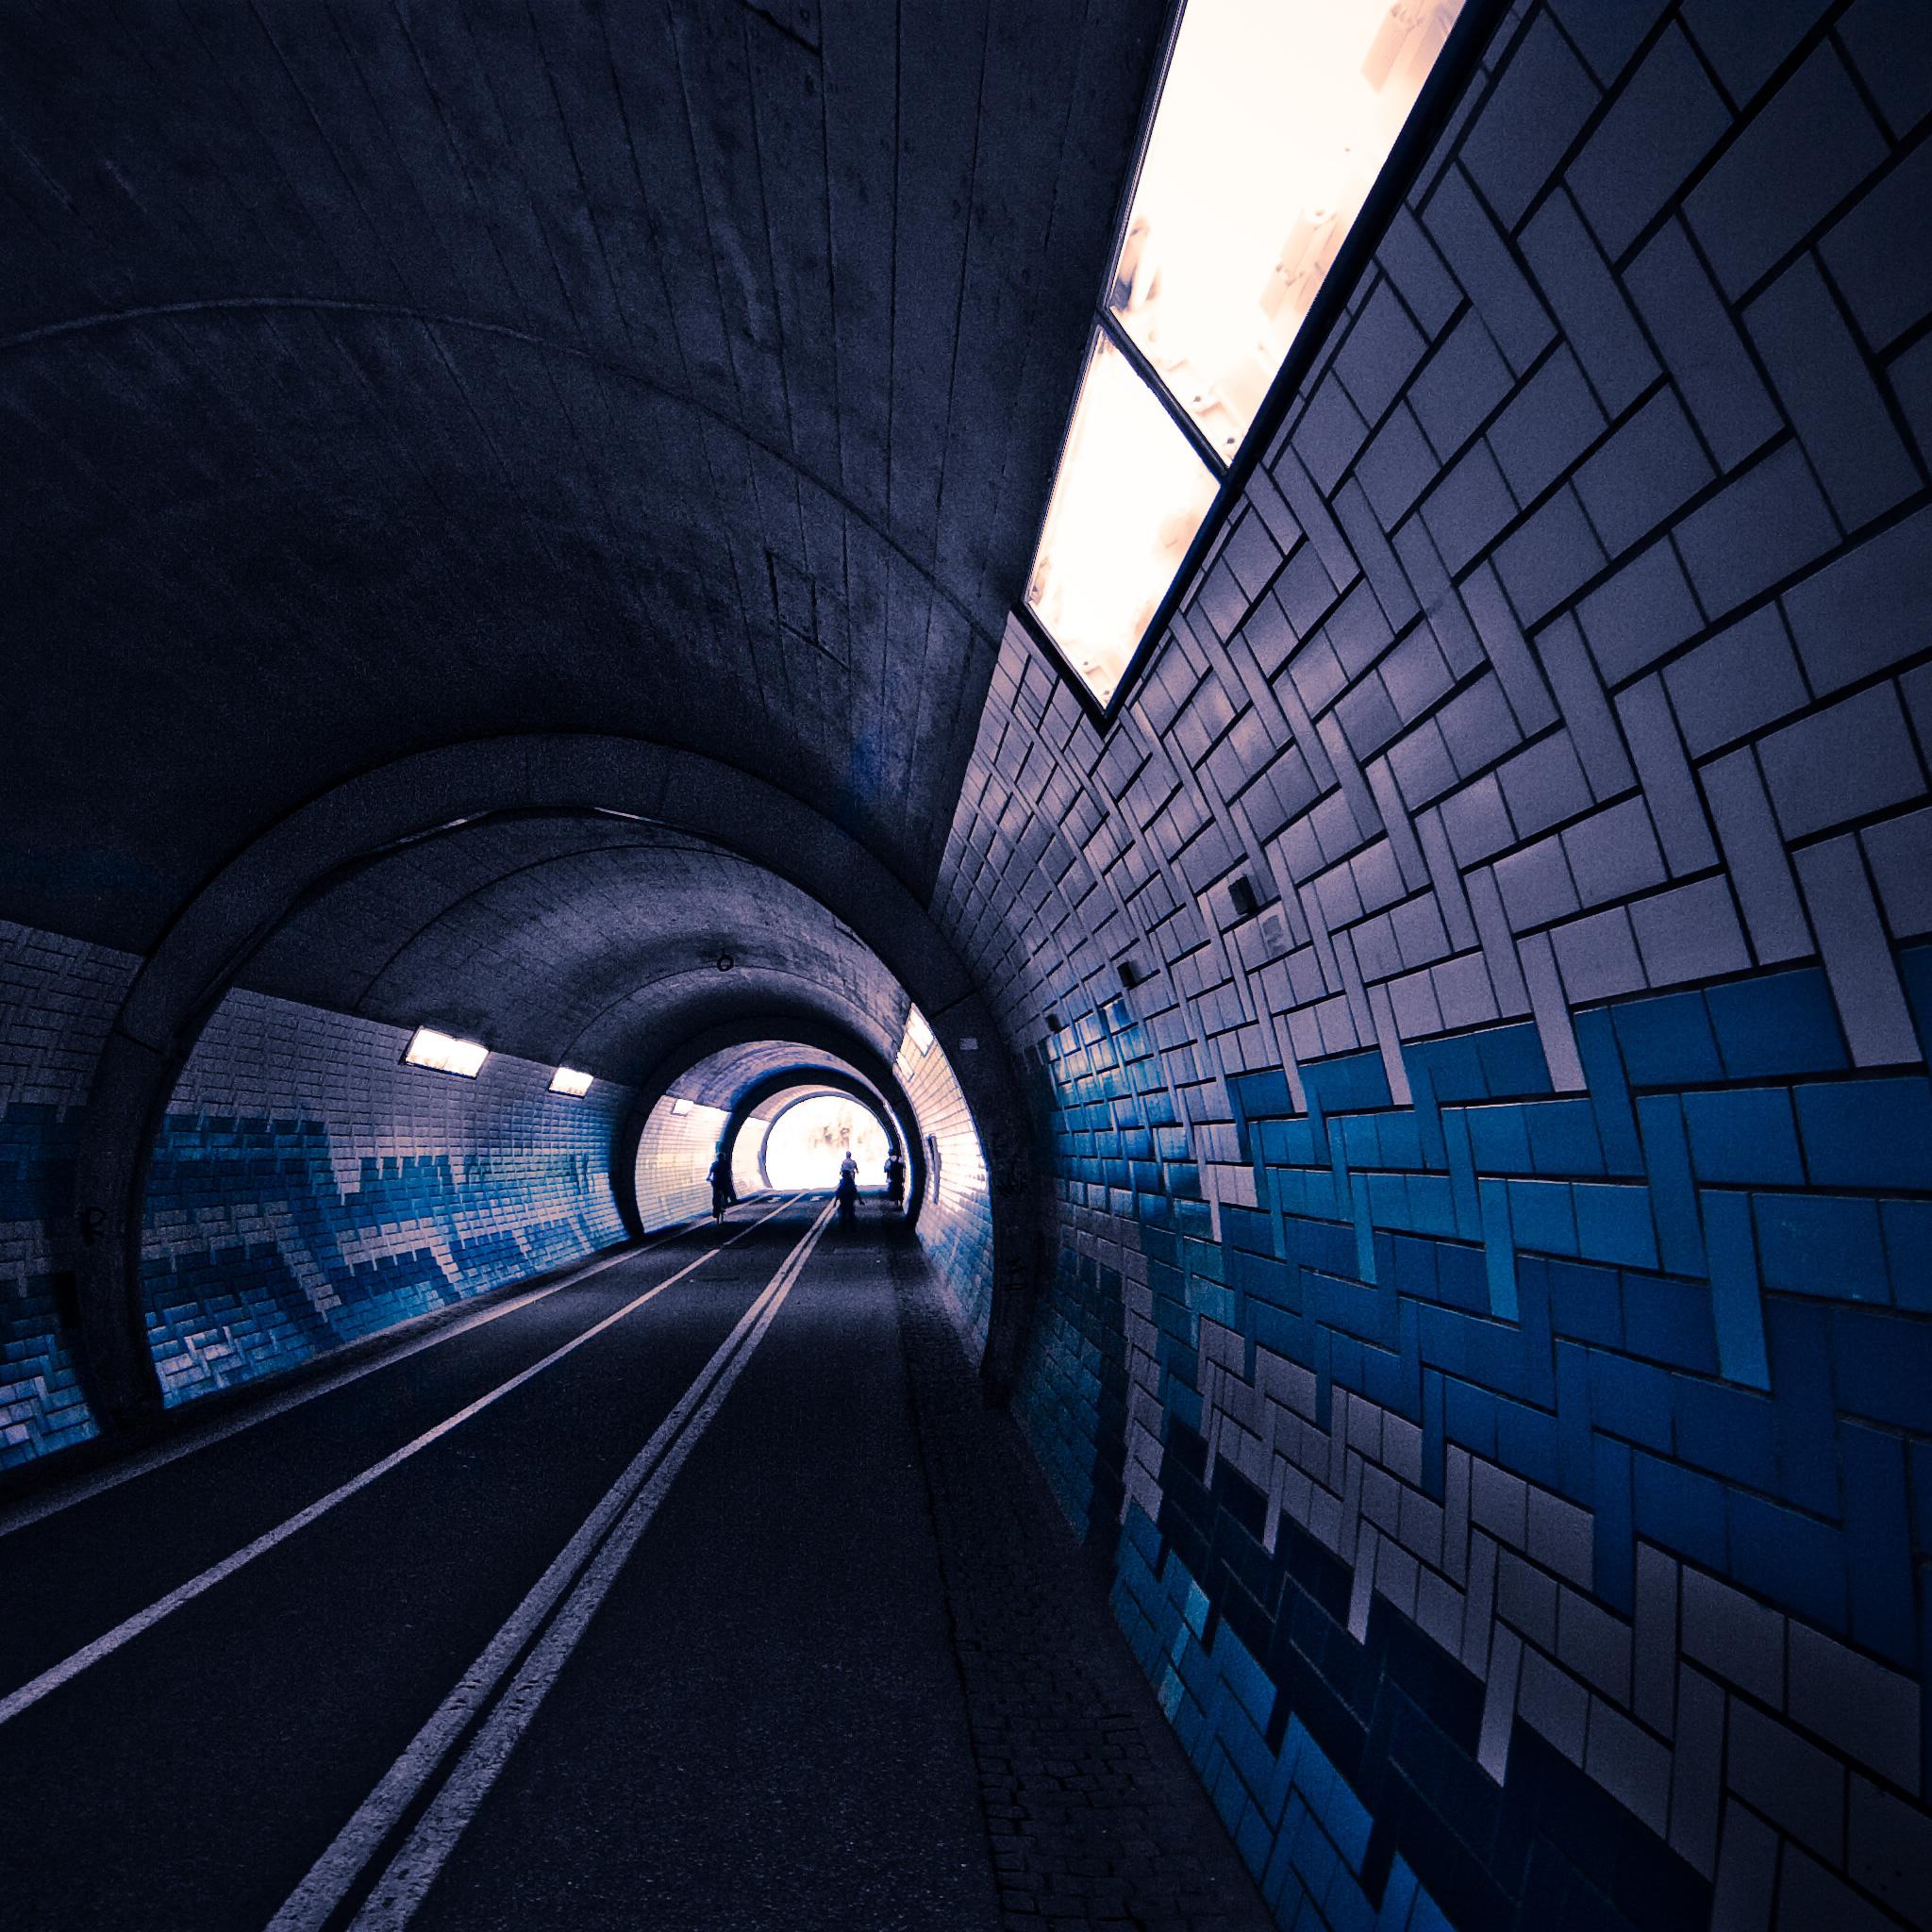 Stunning Tunnel Wallpaper